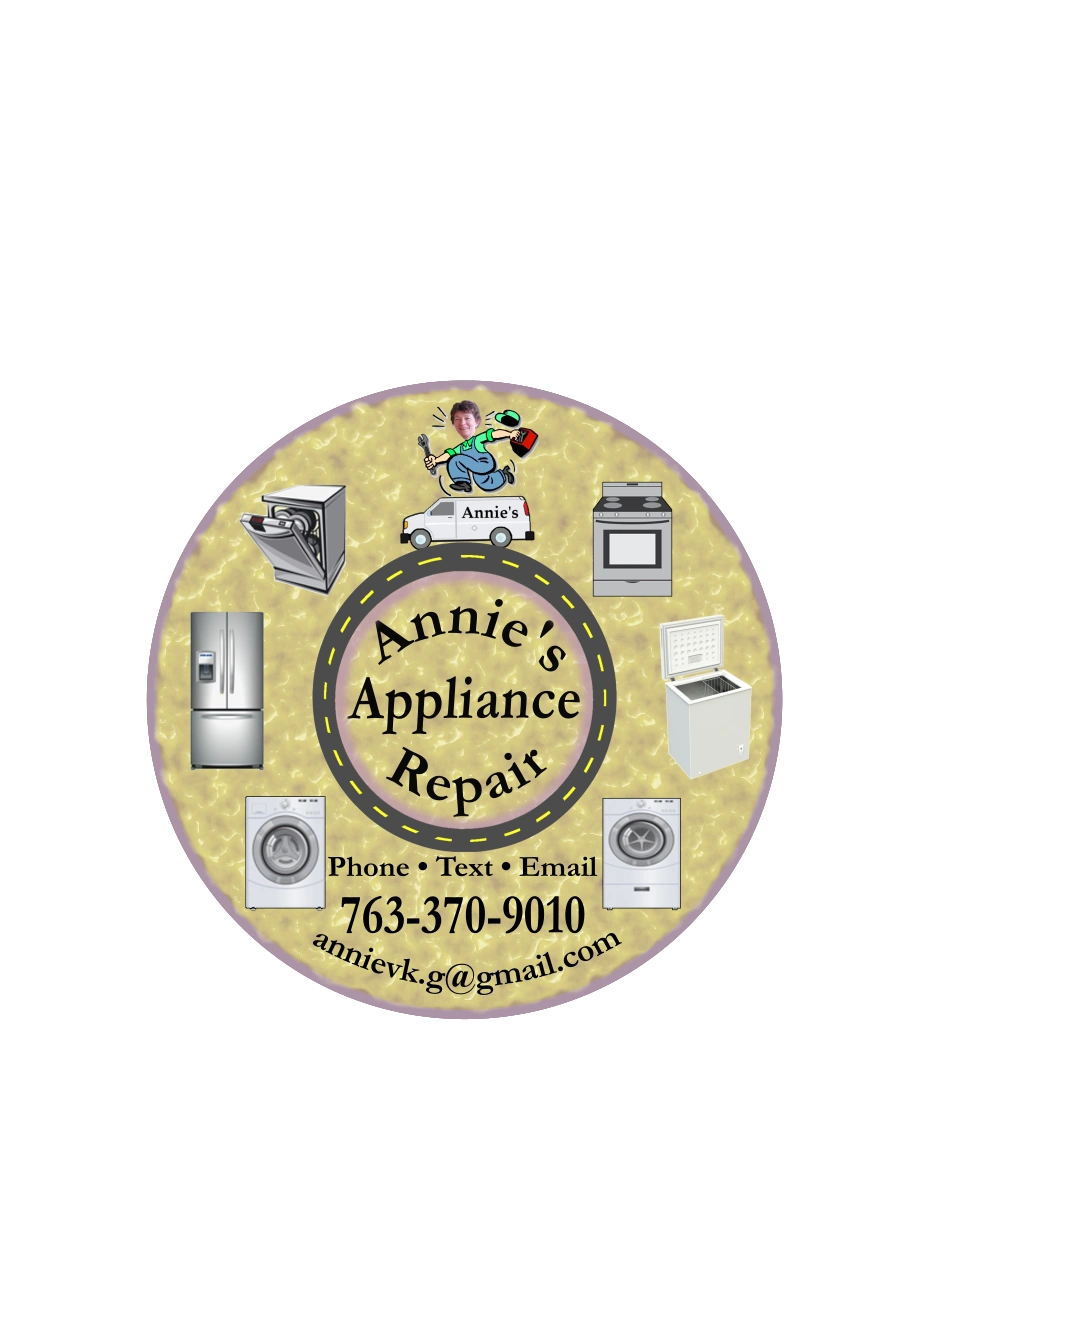 Annie S Appliance Repair Service For Large Home Appliances